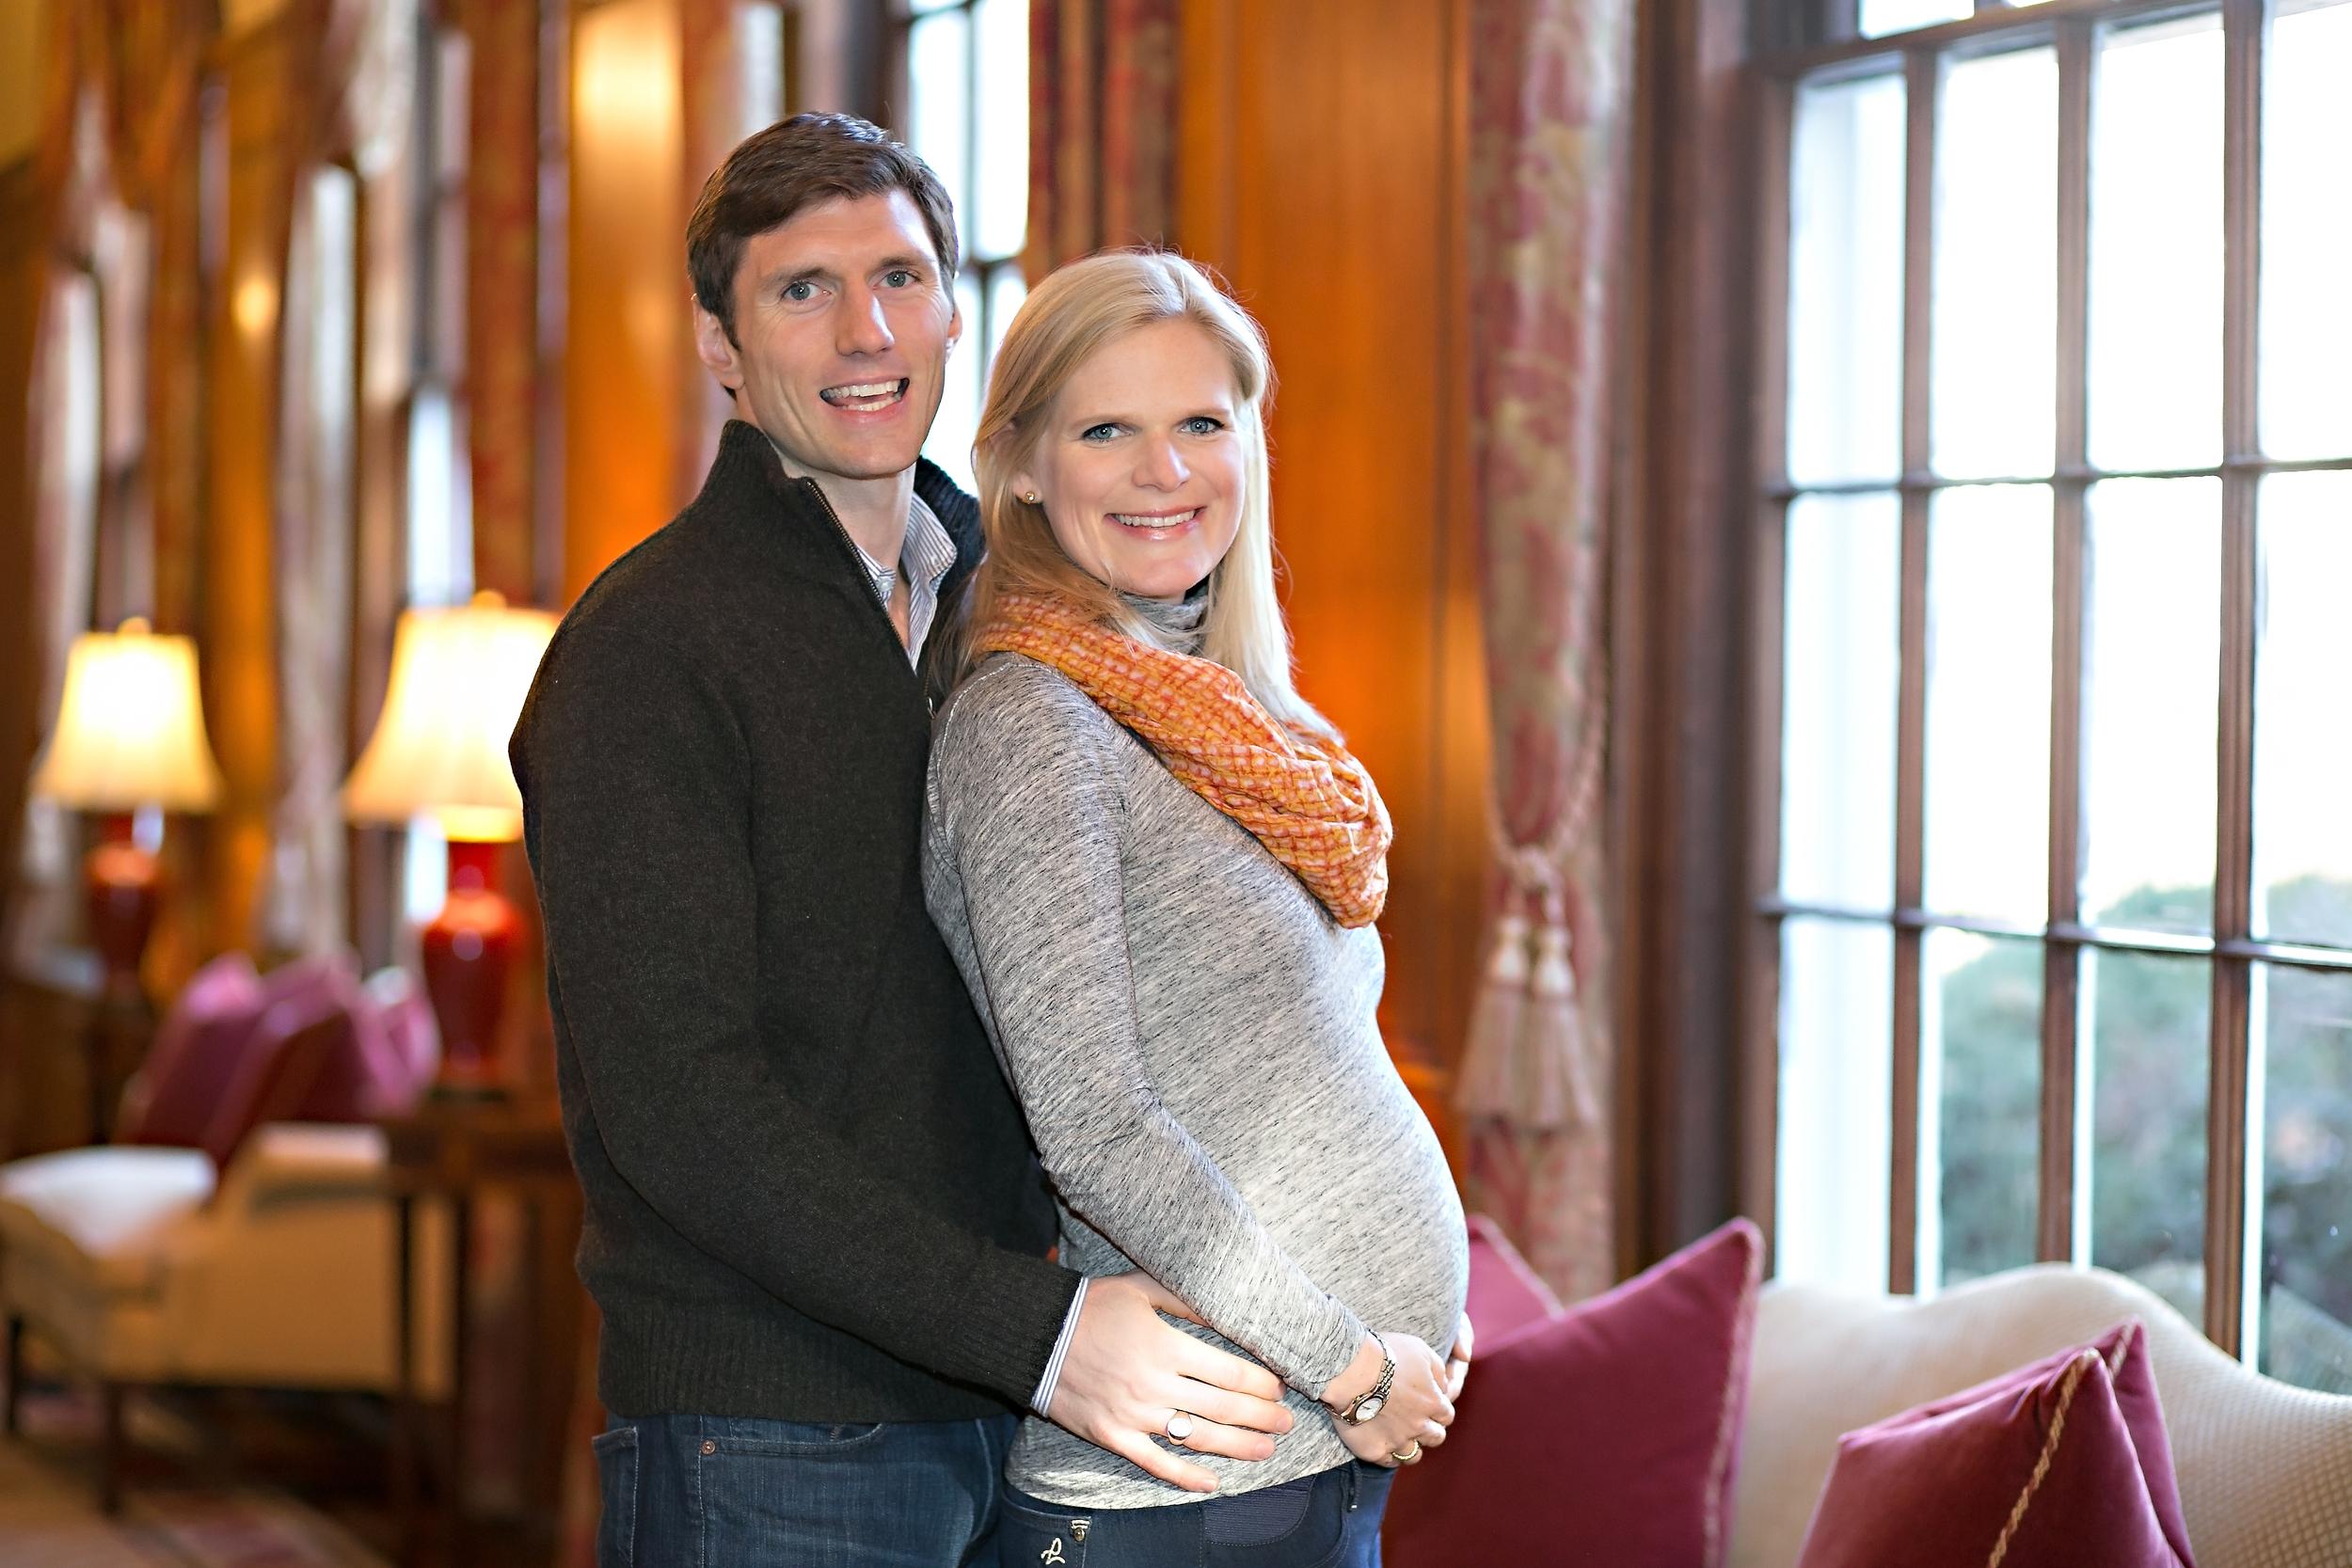 Sale Maternity11.28.2014-143.jpg